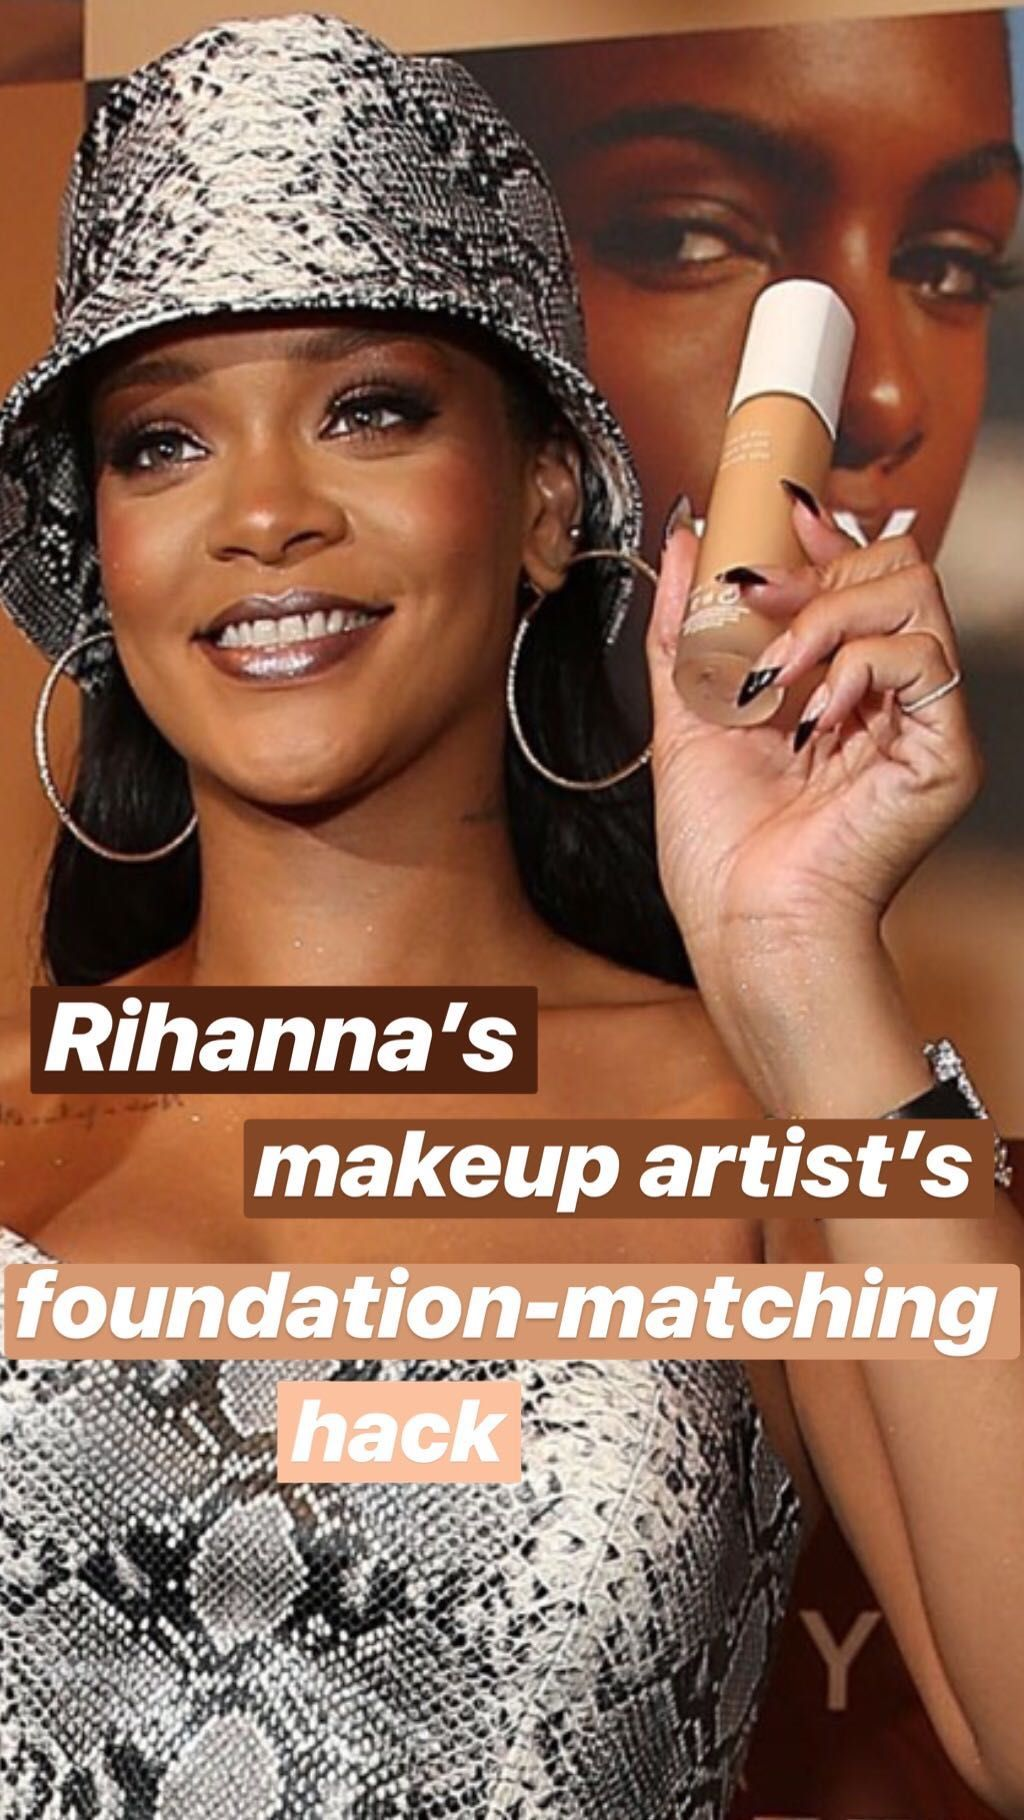 Rihanna's makeup artist has a genius 5-second hack for matching foundation to your skin tone -   13 makeup DIY hacks ideas